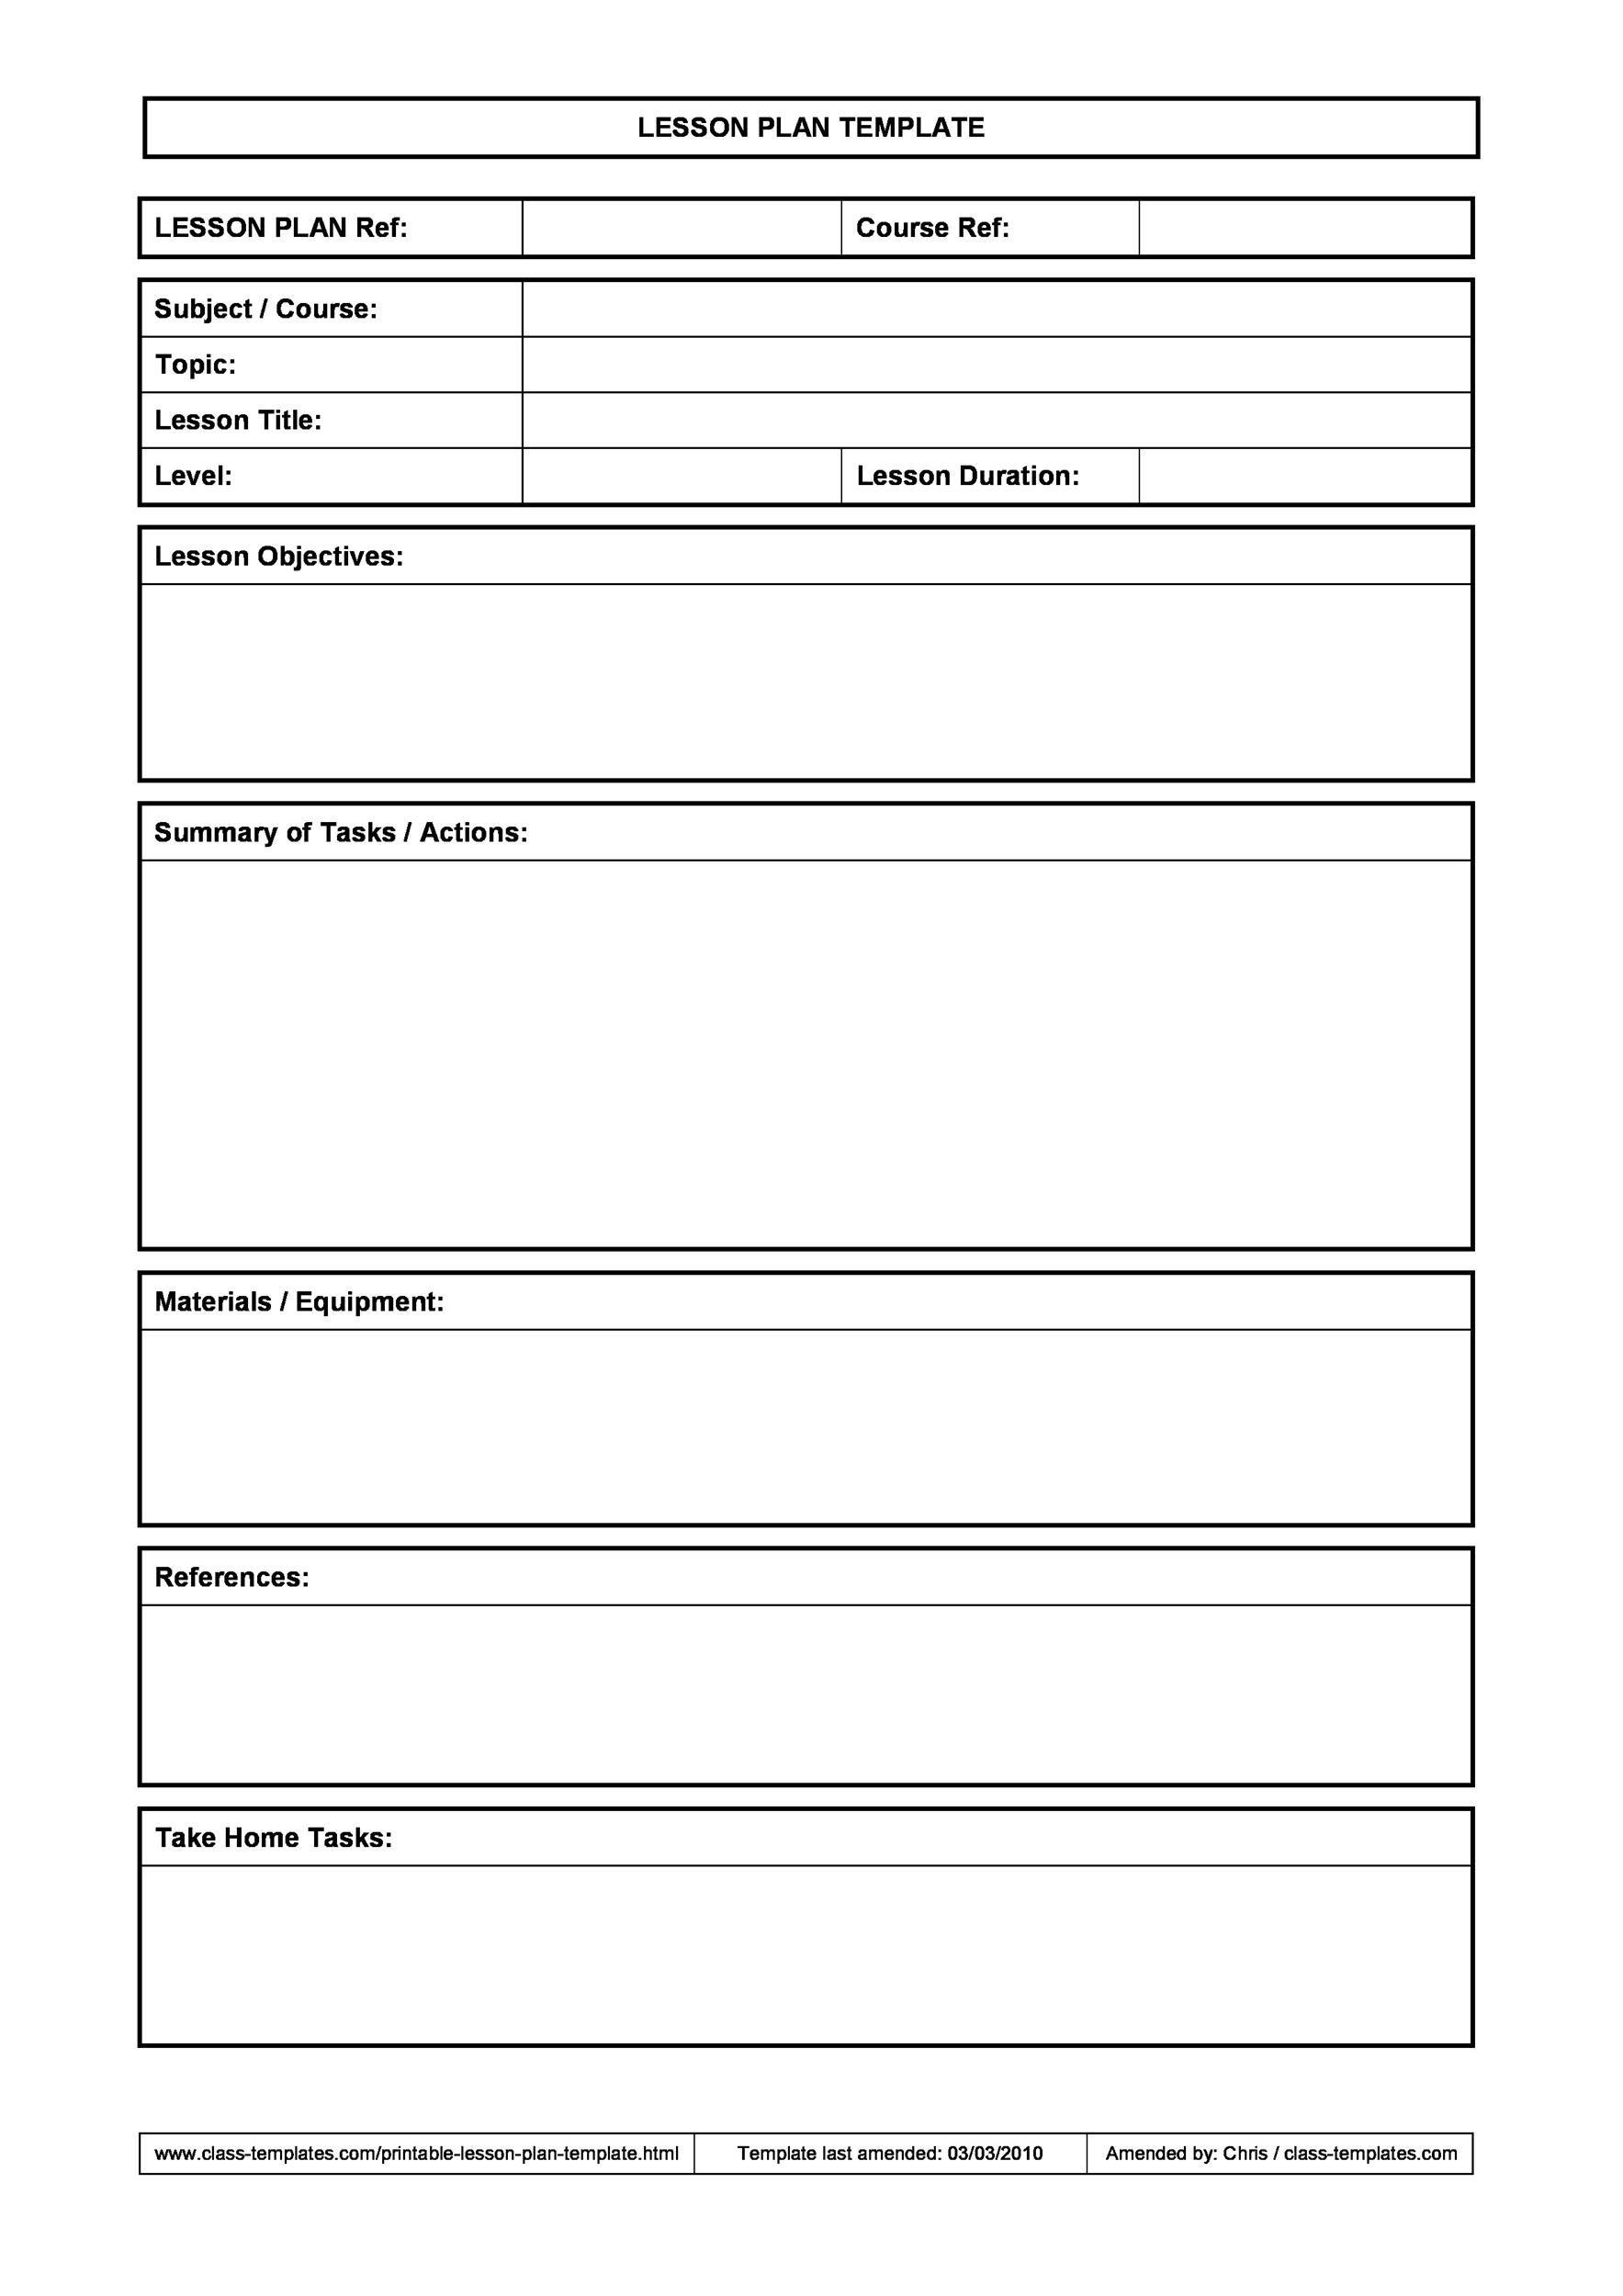 009 Amazing Unit Lesson Plan Template Idea  Templates Thematic Example Mini FormatFull